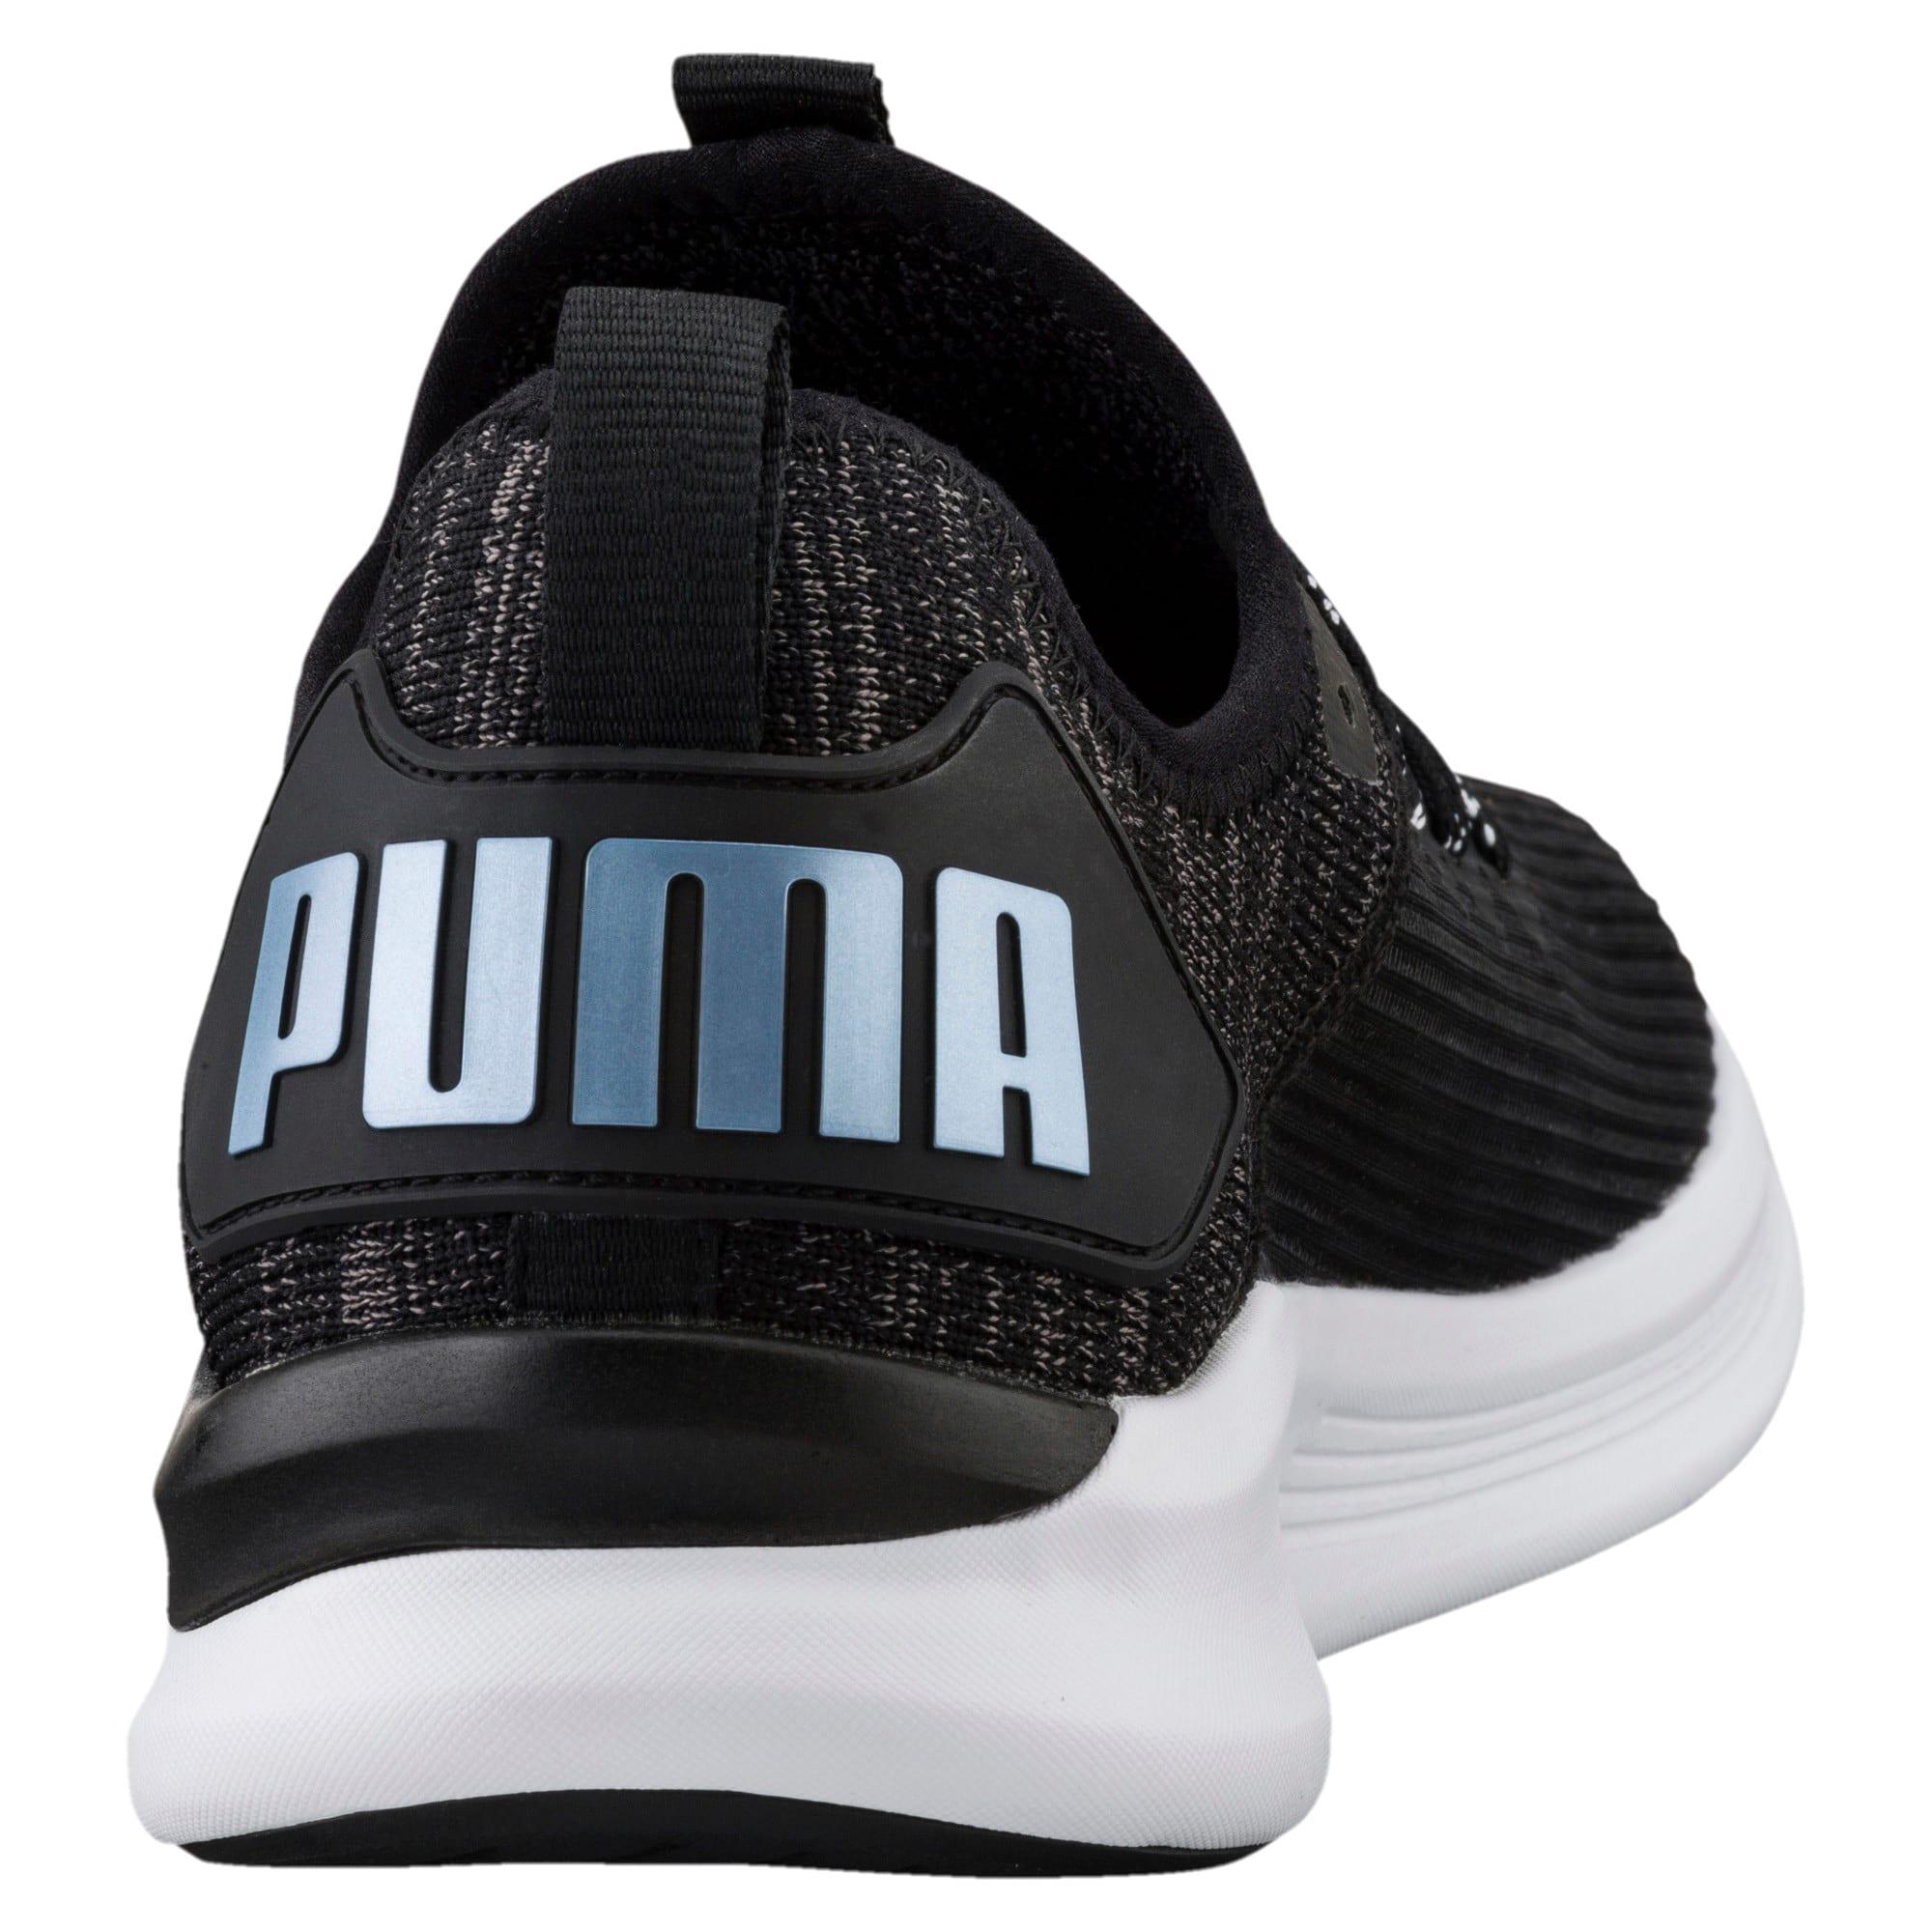 Thumbnail 2 of IGNITE Flash Stripped Men's Running Shoes, Puma Black-QUIET SHADE, medium-IND